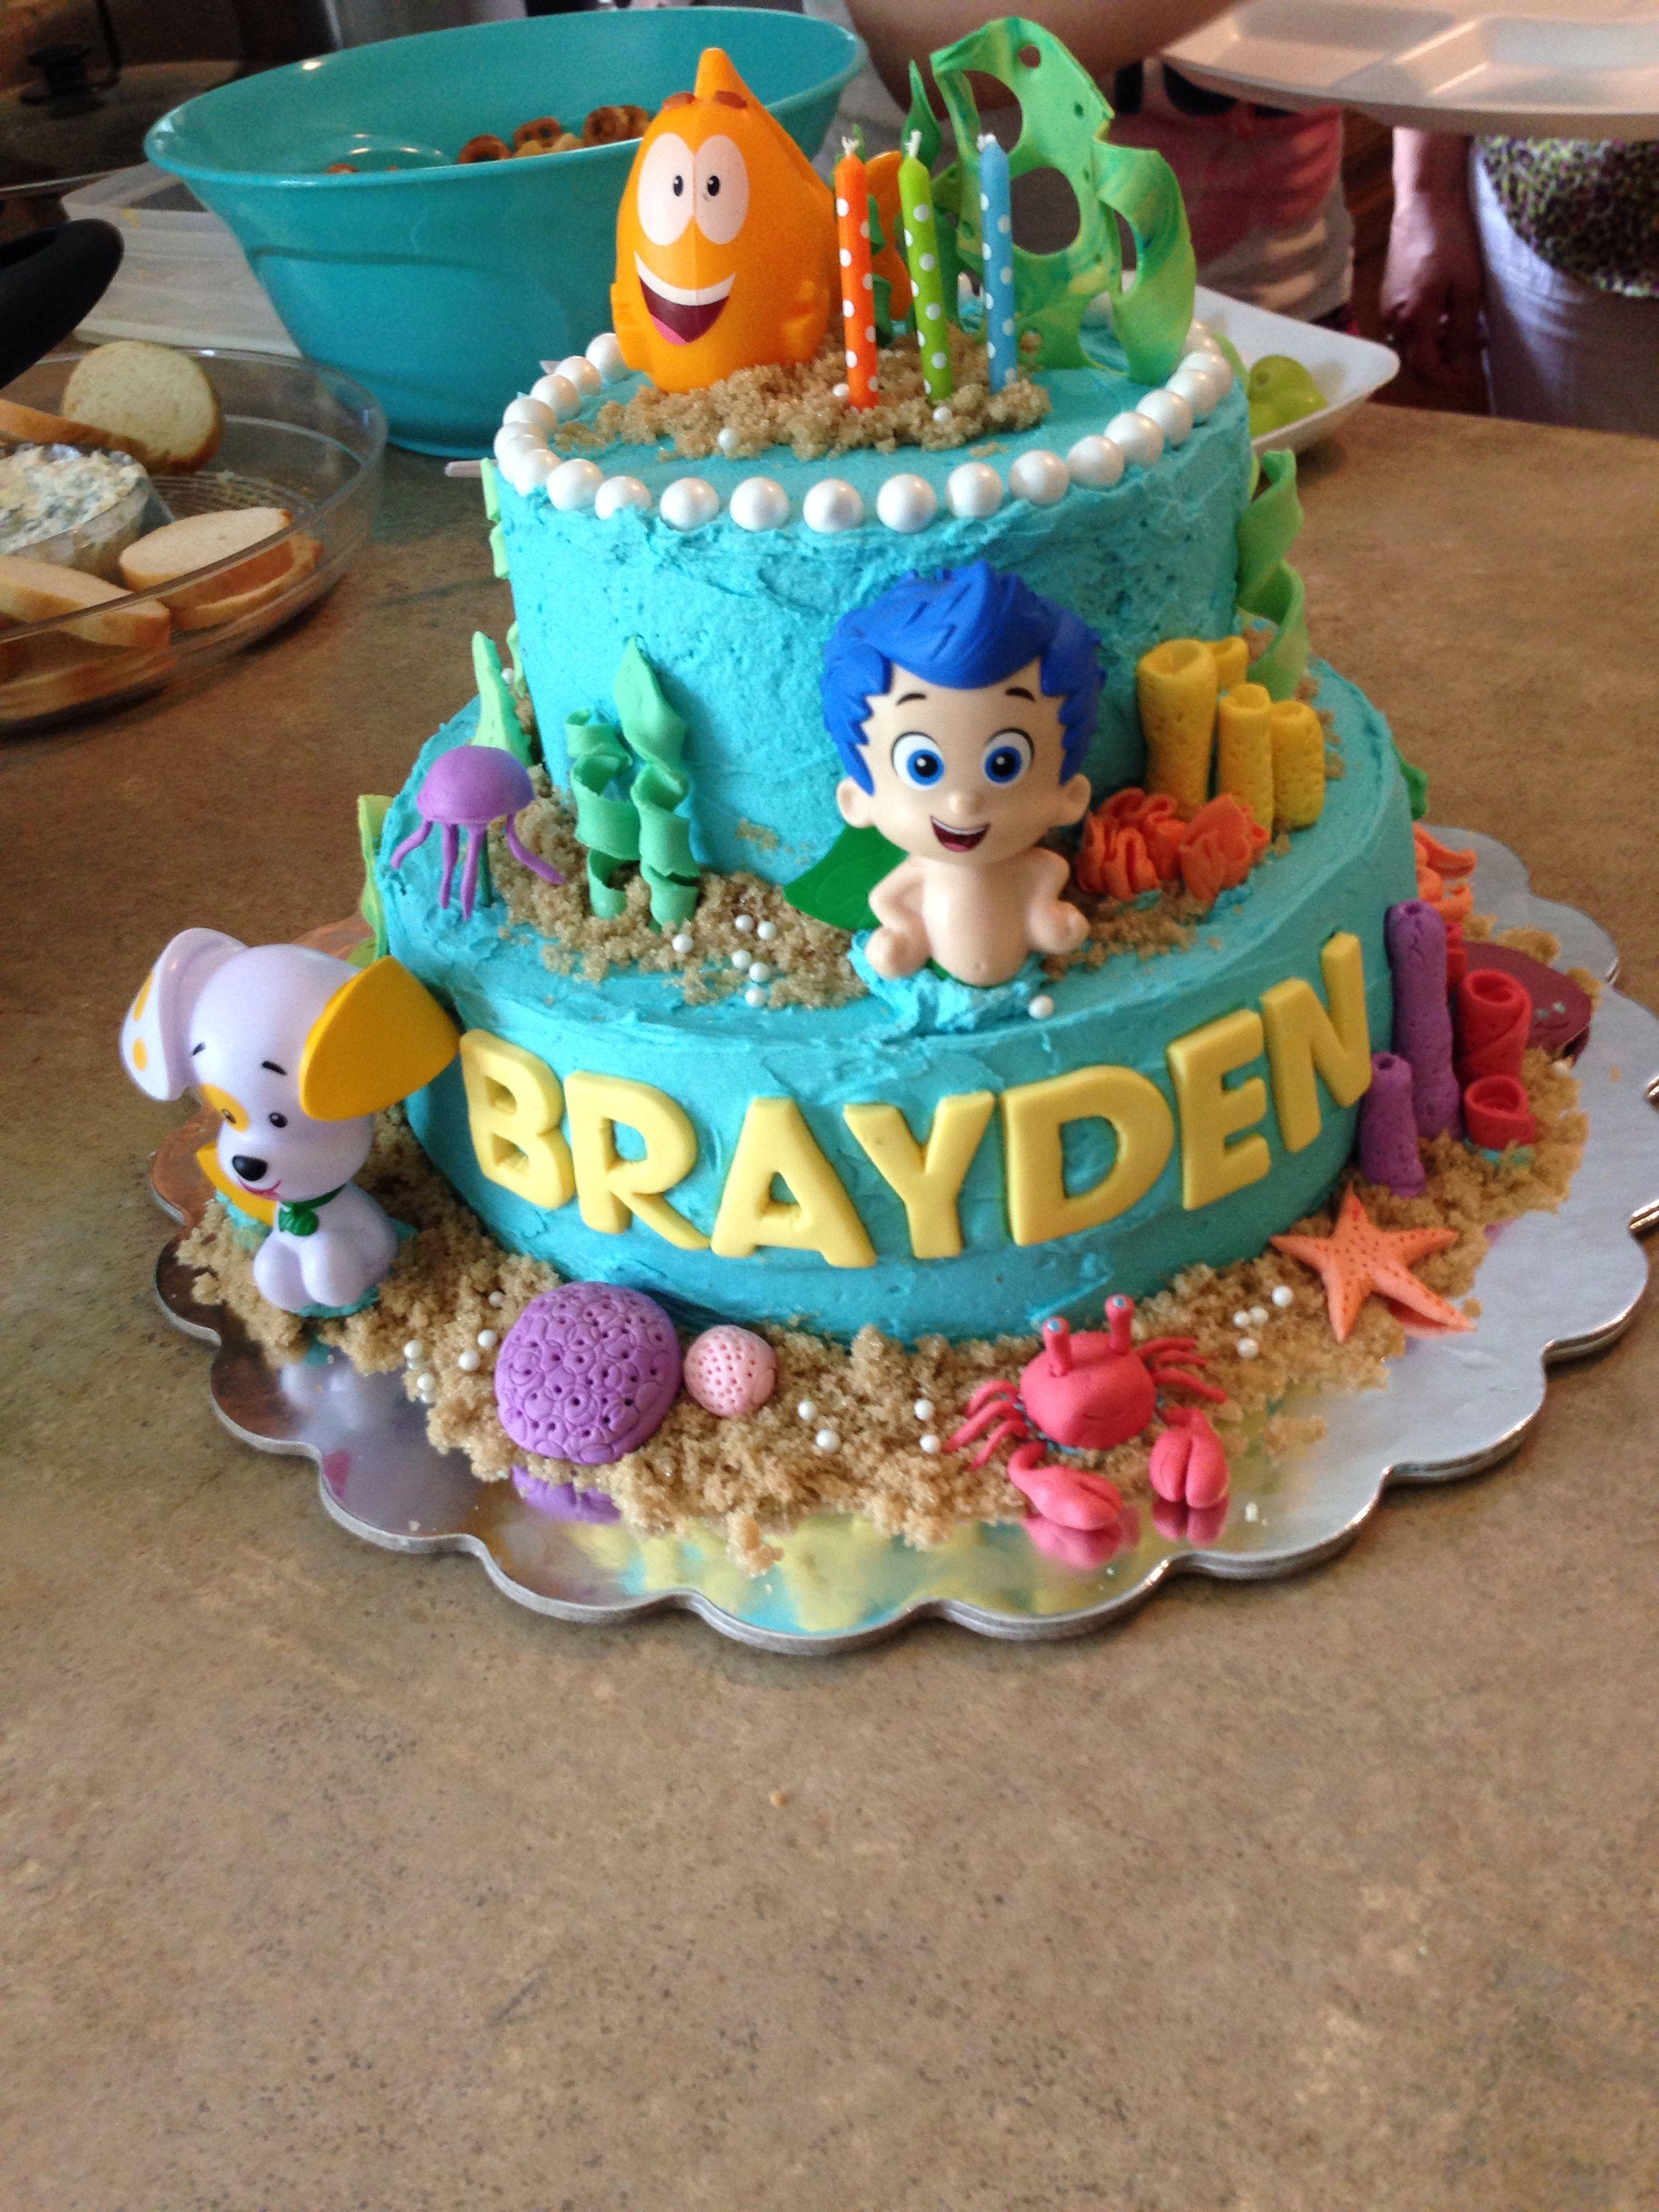 My Sons Bubble Guppie Cake Bubble Guppies Birthday Cake Bubble Guppies Cake Boy Birthday Cake